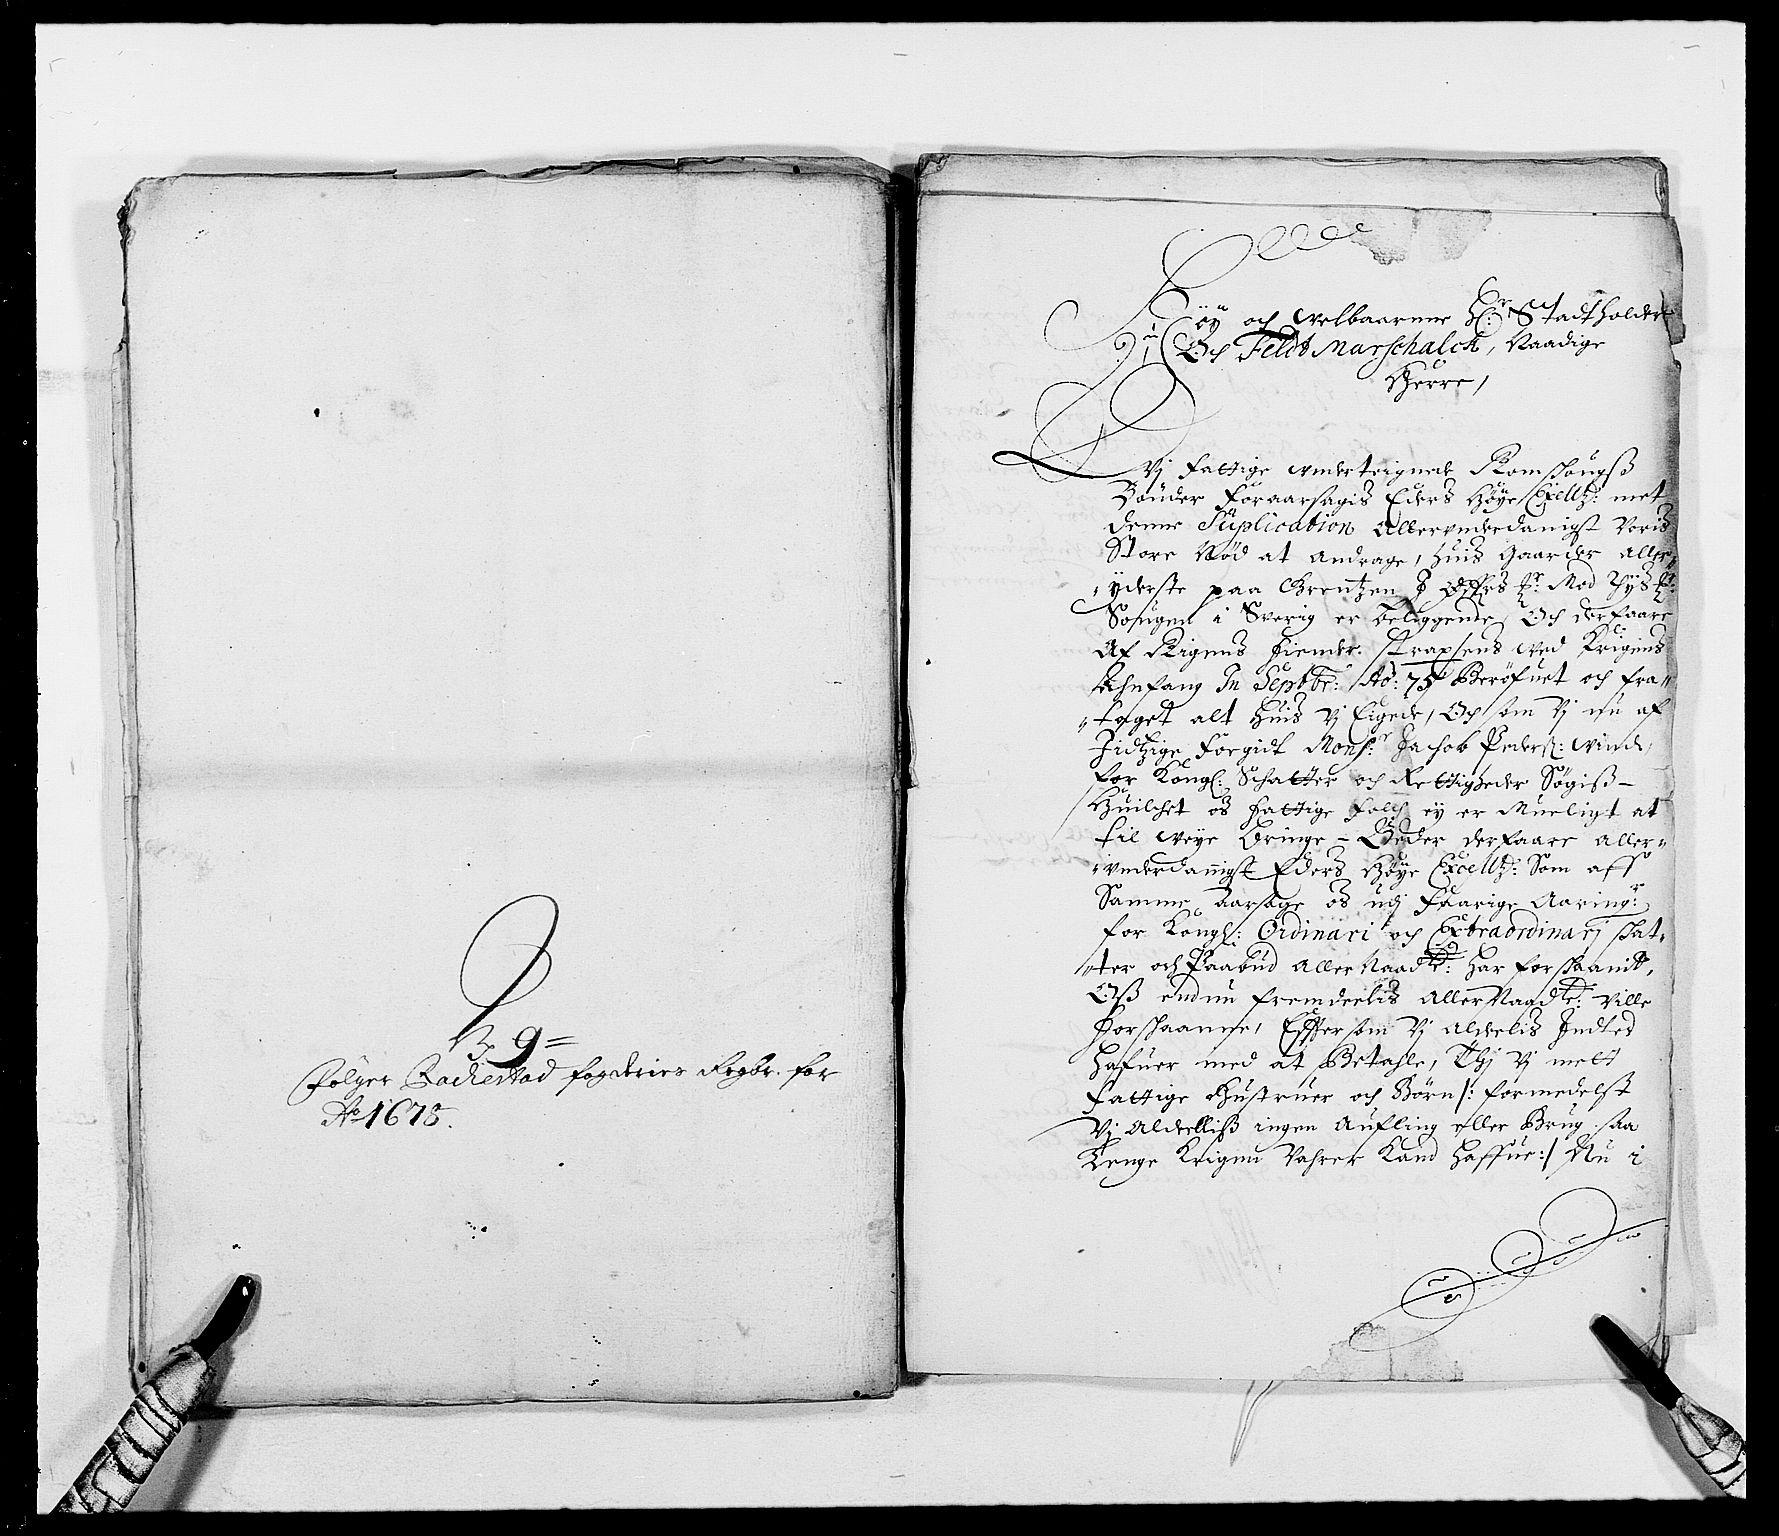 RA, Rentekammeret inntil 1814, Reviderte regnskaper, Fogderegnskap, R05/L0271: Fogderegnskap Rakkestad, 1678-1679, s. 525